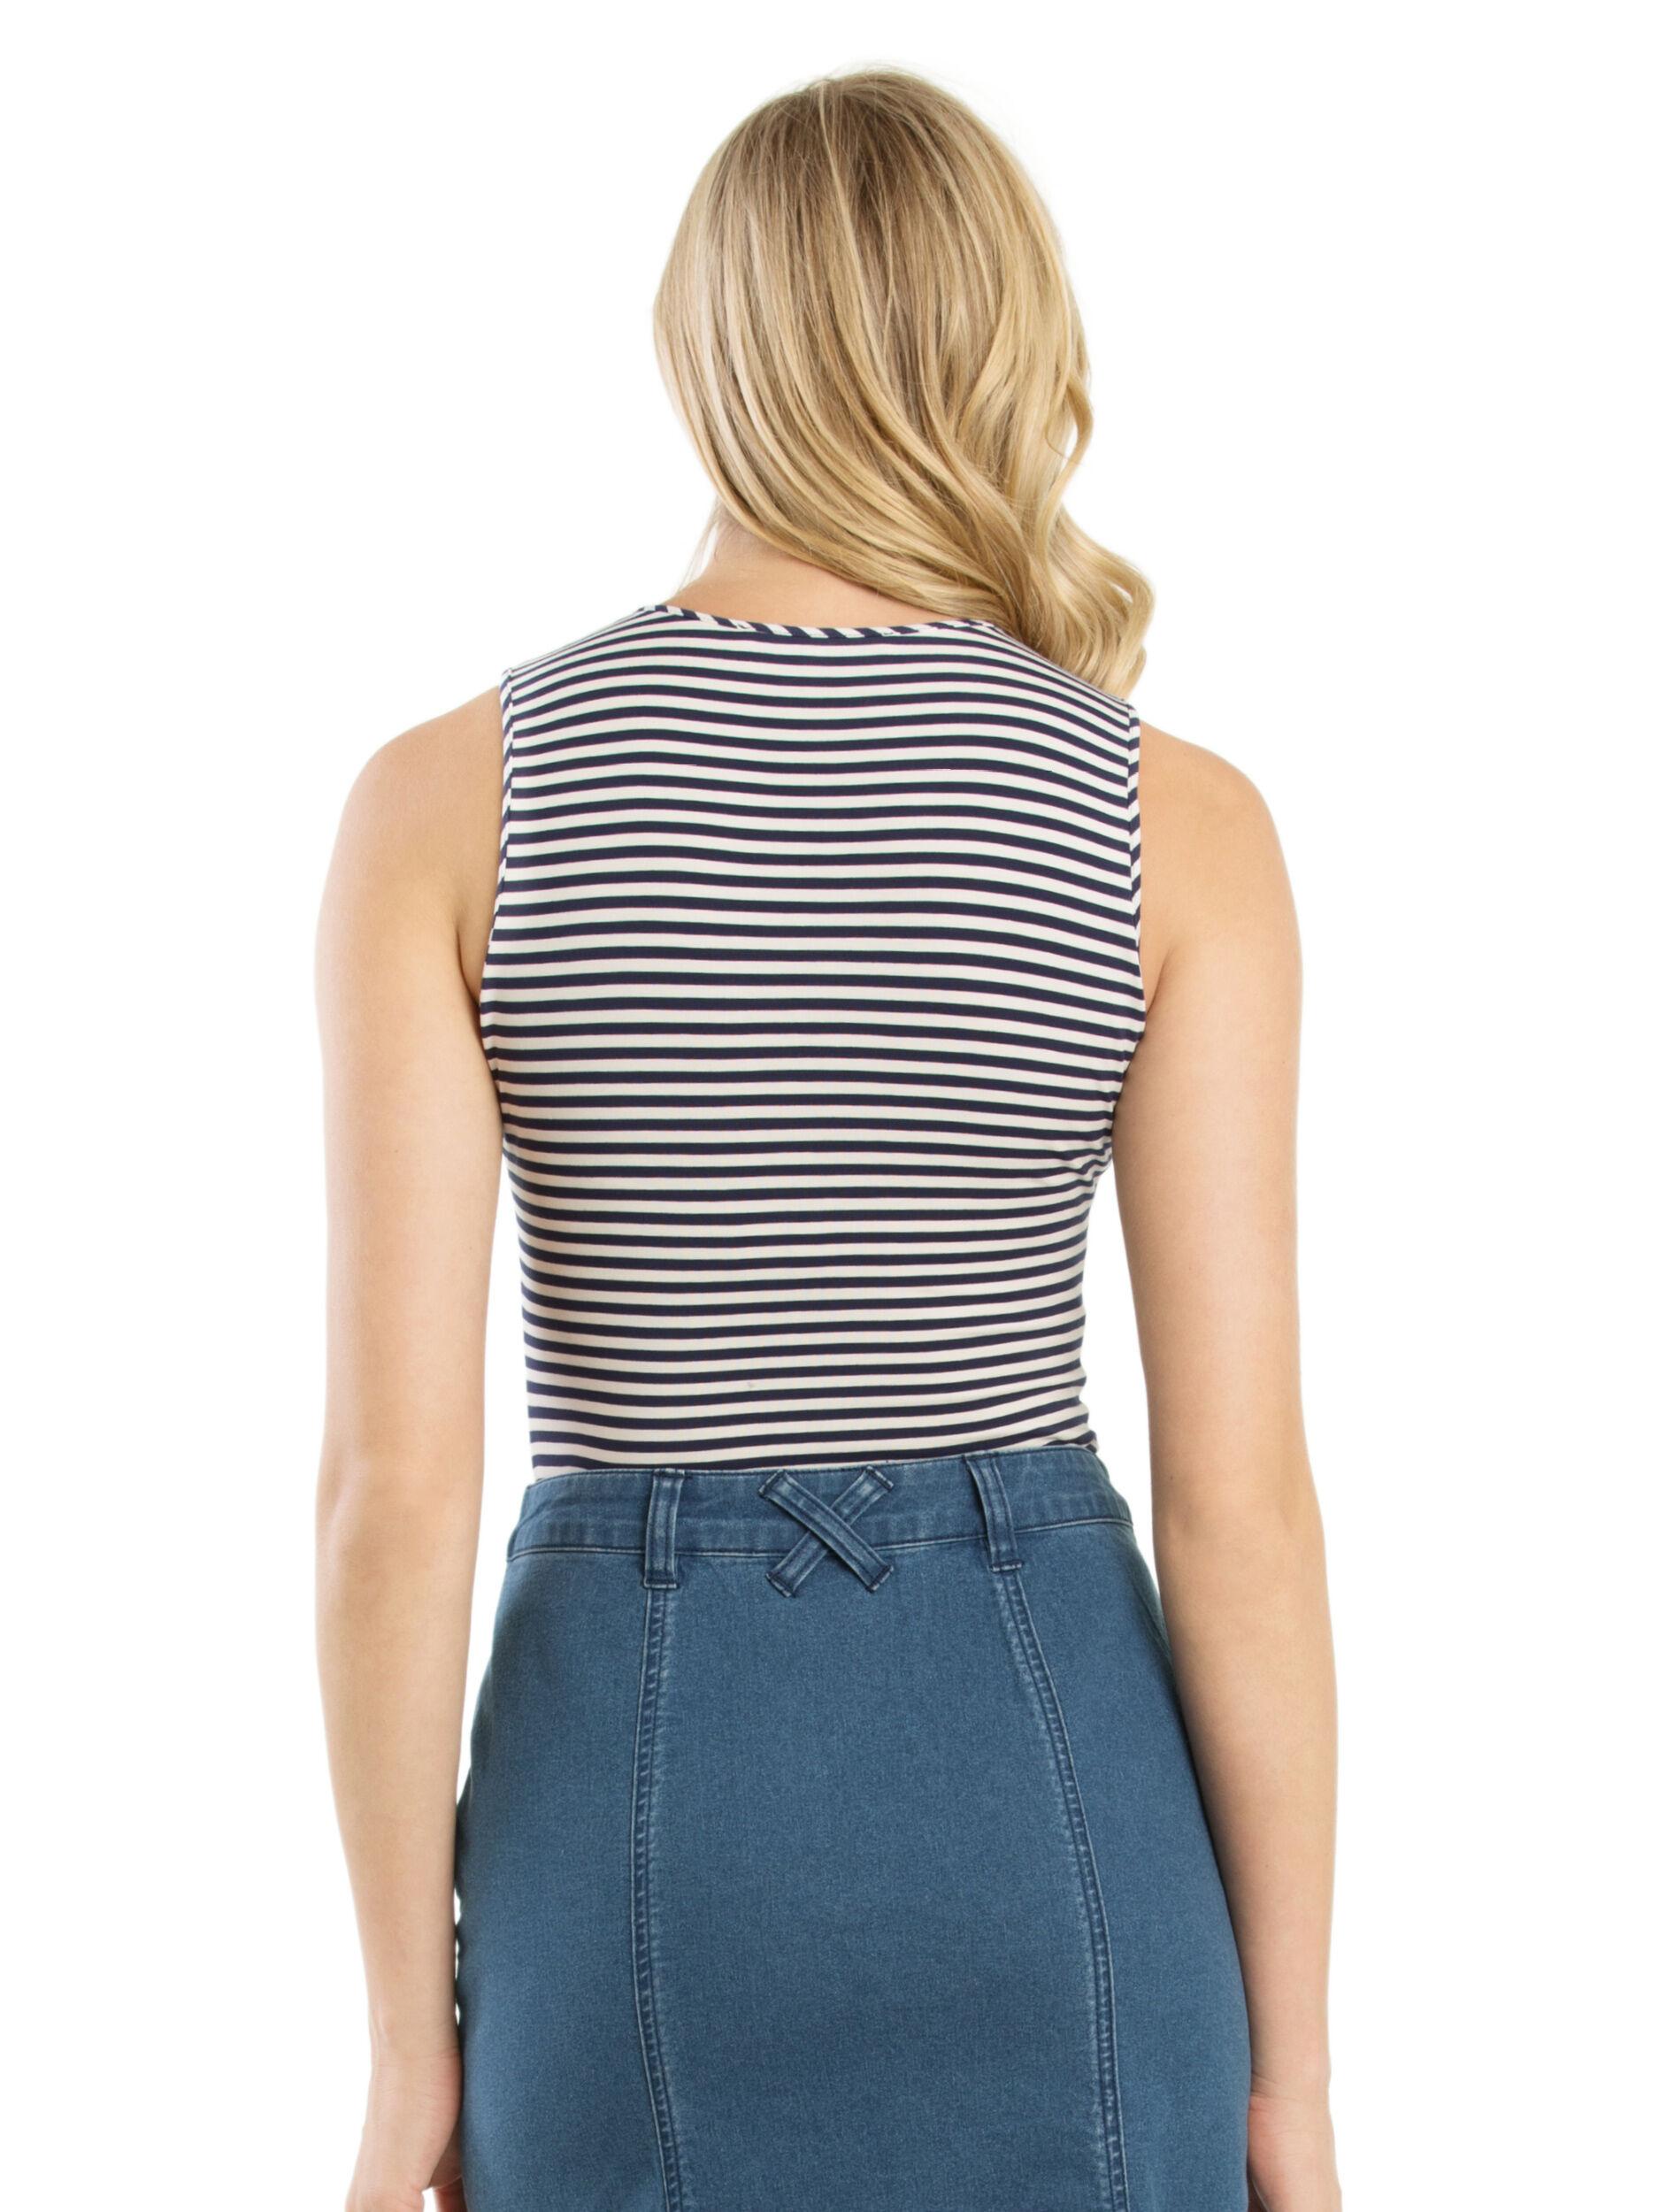 Mariner Stripe Top